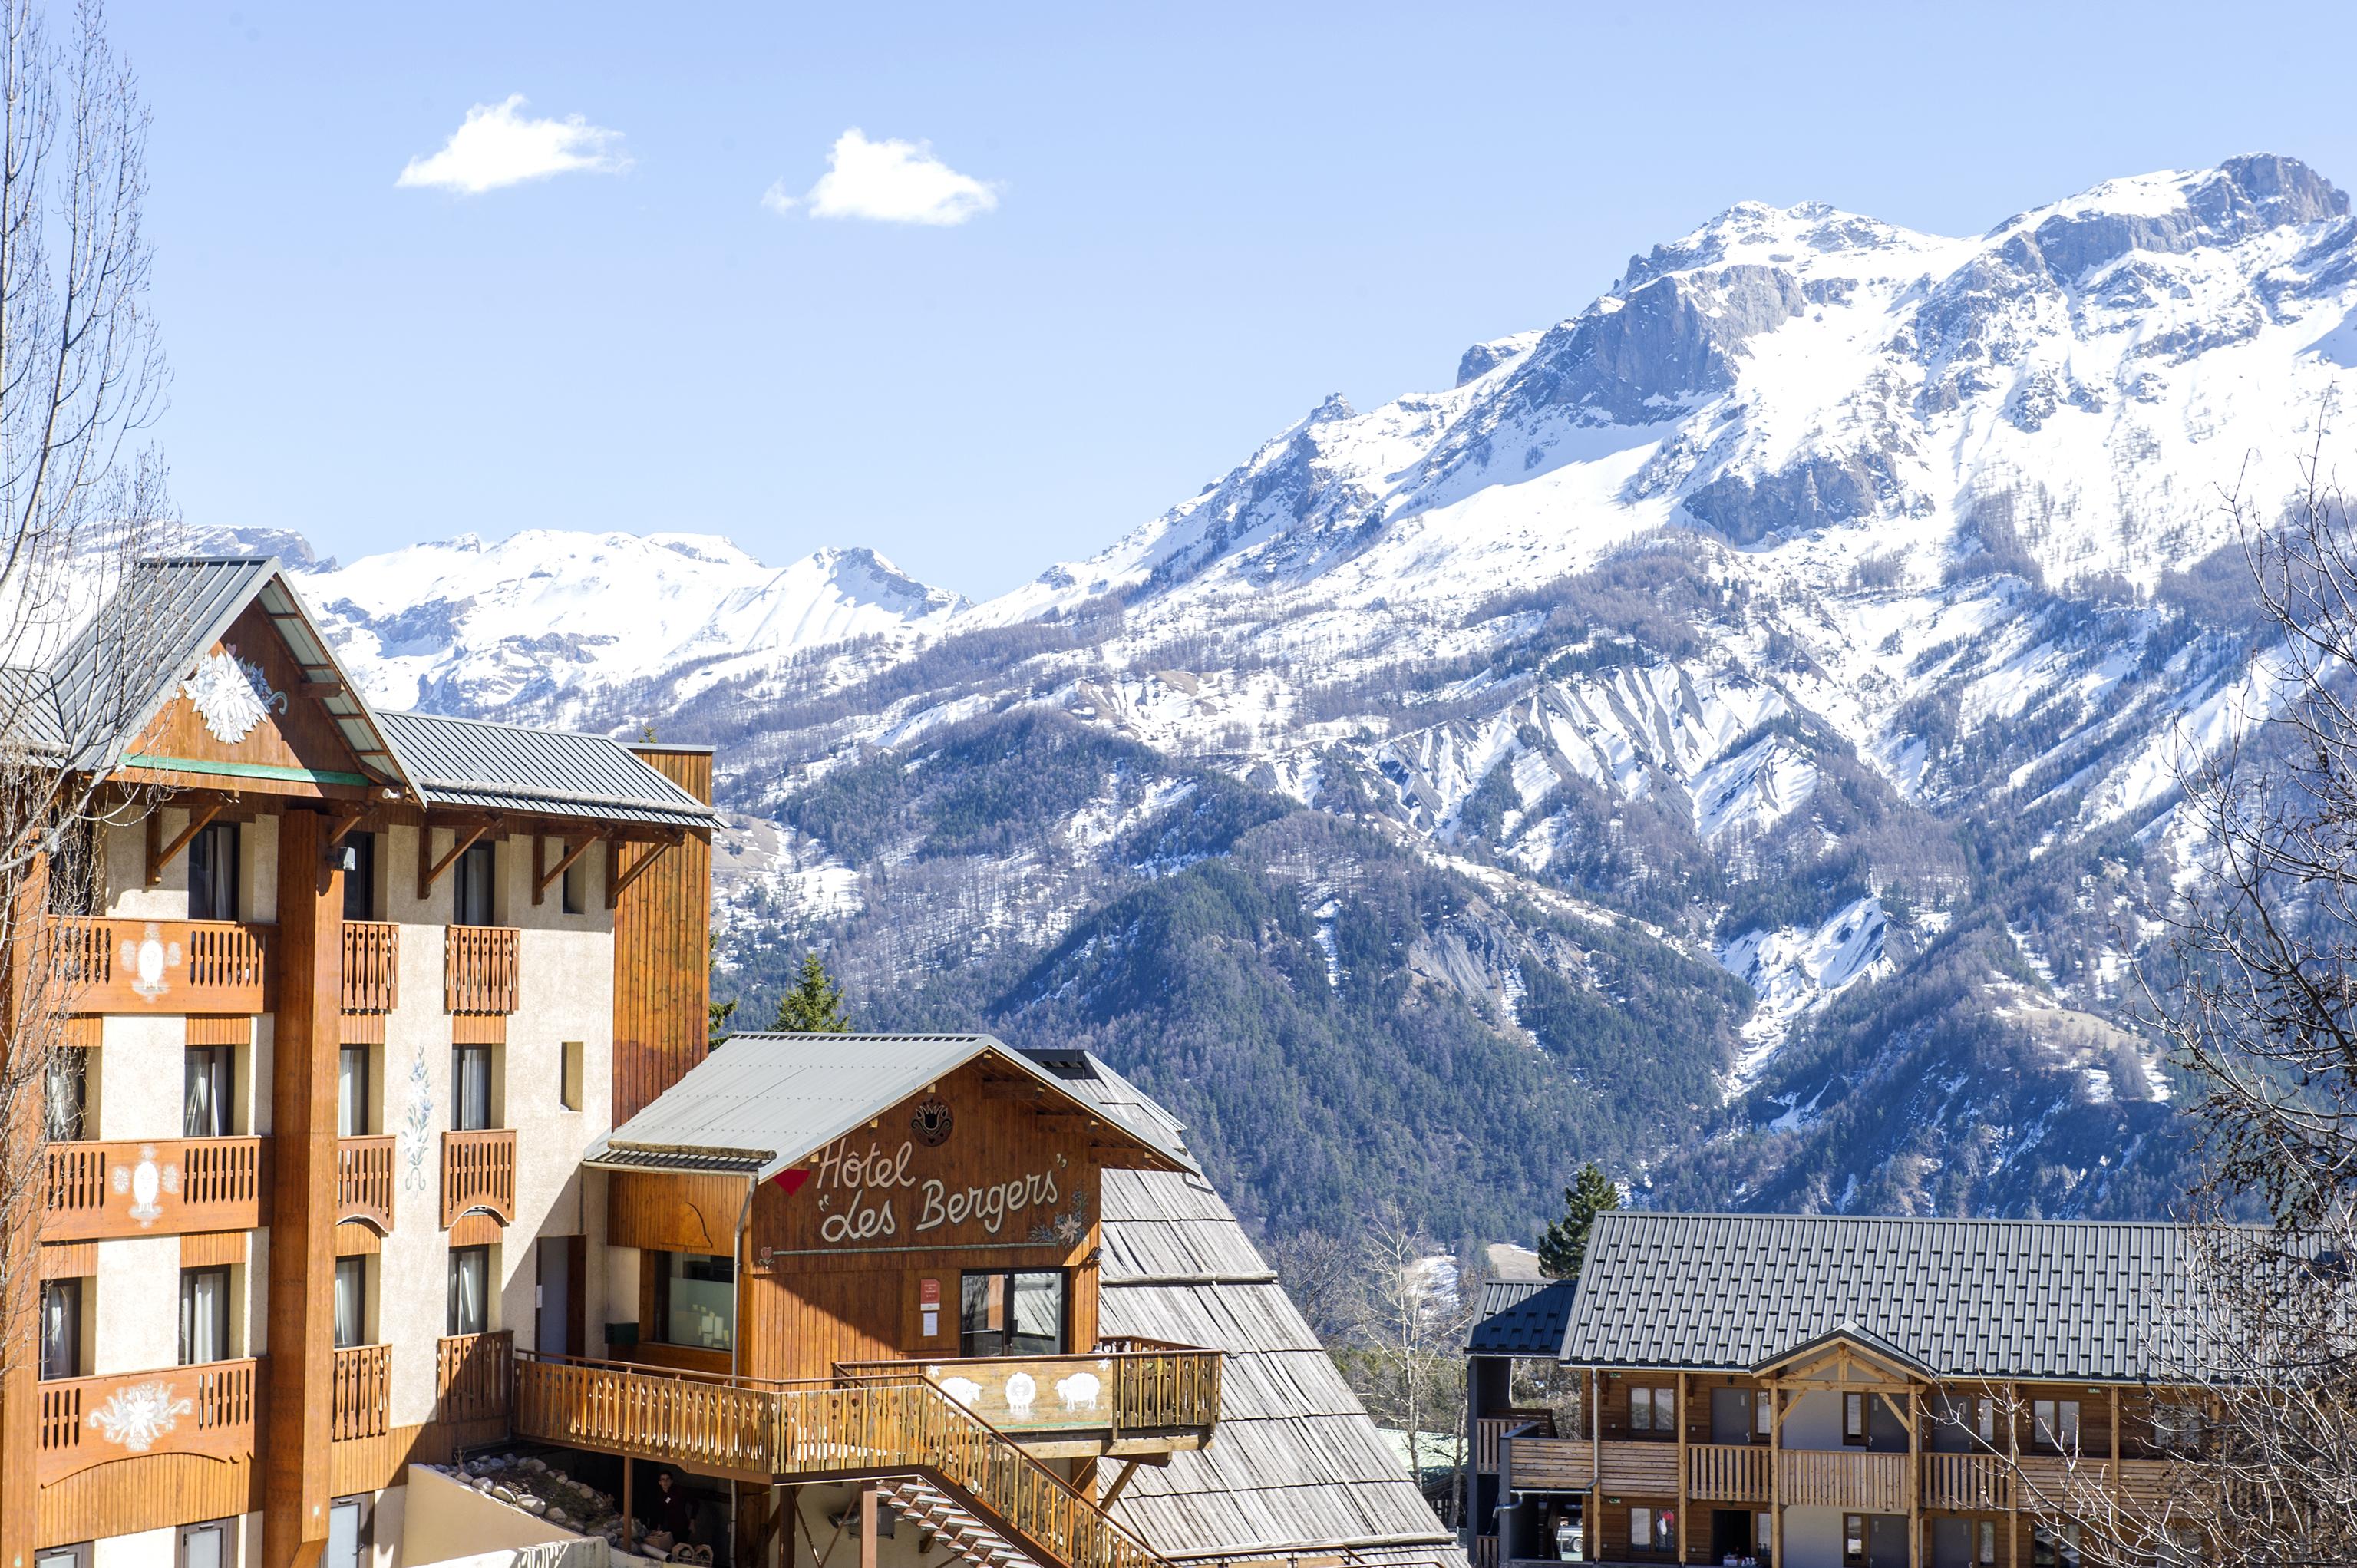 Club Bergers Resorts, Alpes-de-Haute-Provence